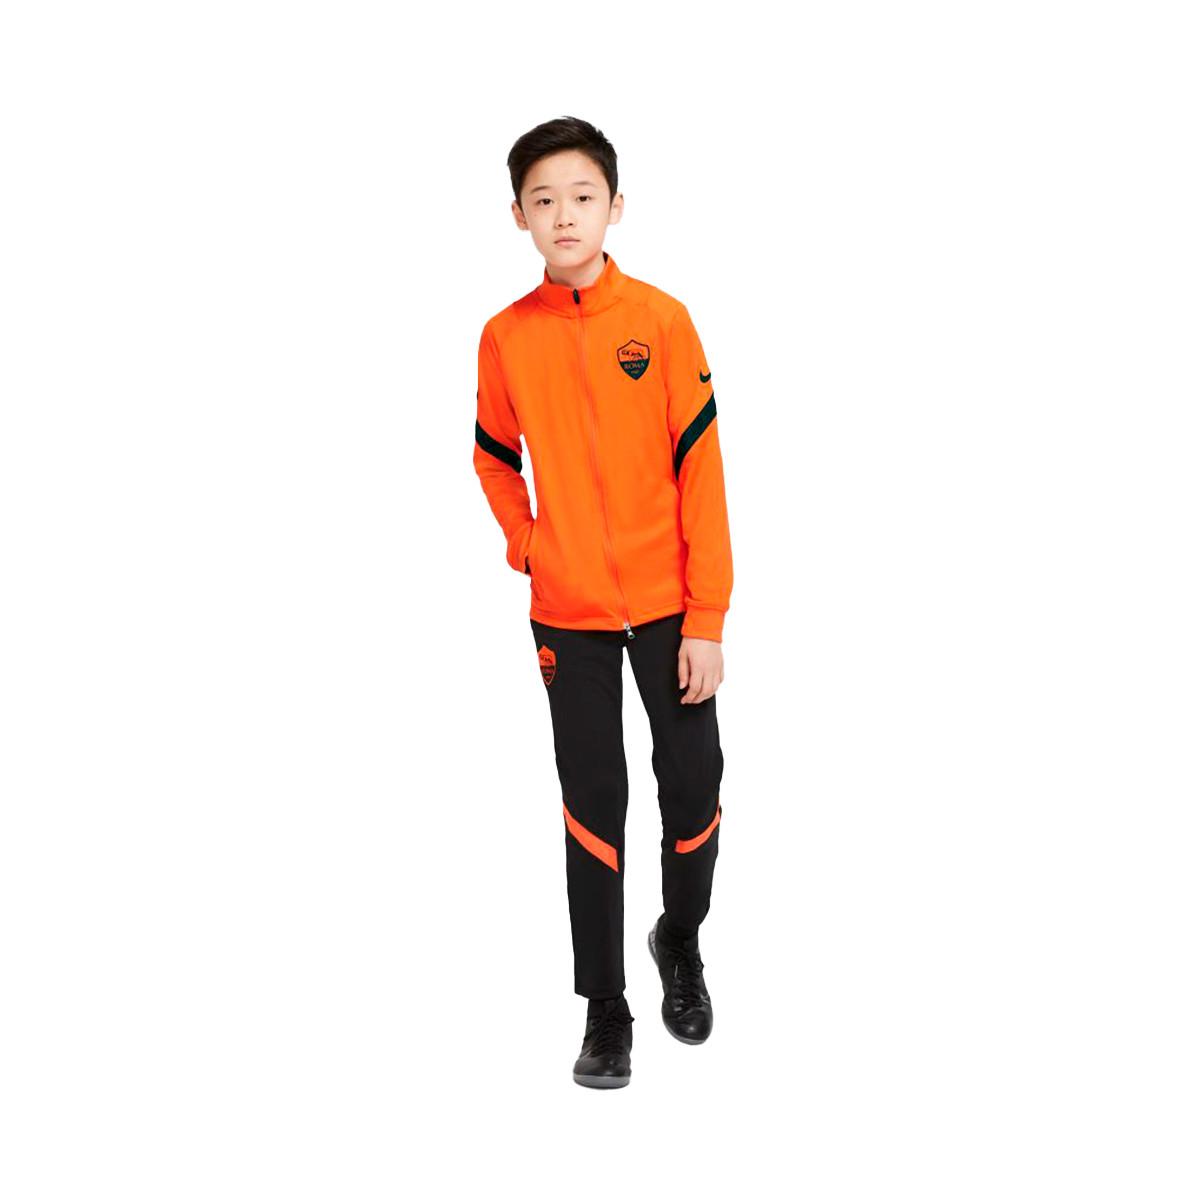 libertad Indica reporte  Chándal Nike AS Roma Dri-Fit Strike CL 2020-2021 Niño Safety orange-Black -  Tienda de fútbol Fútbol Emotion